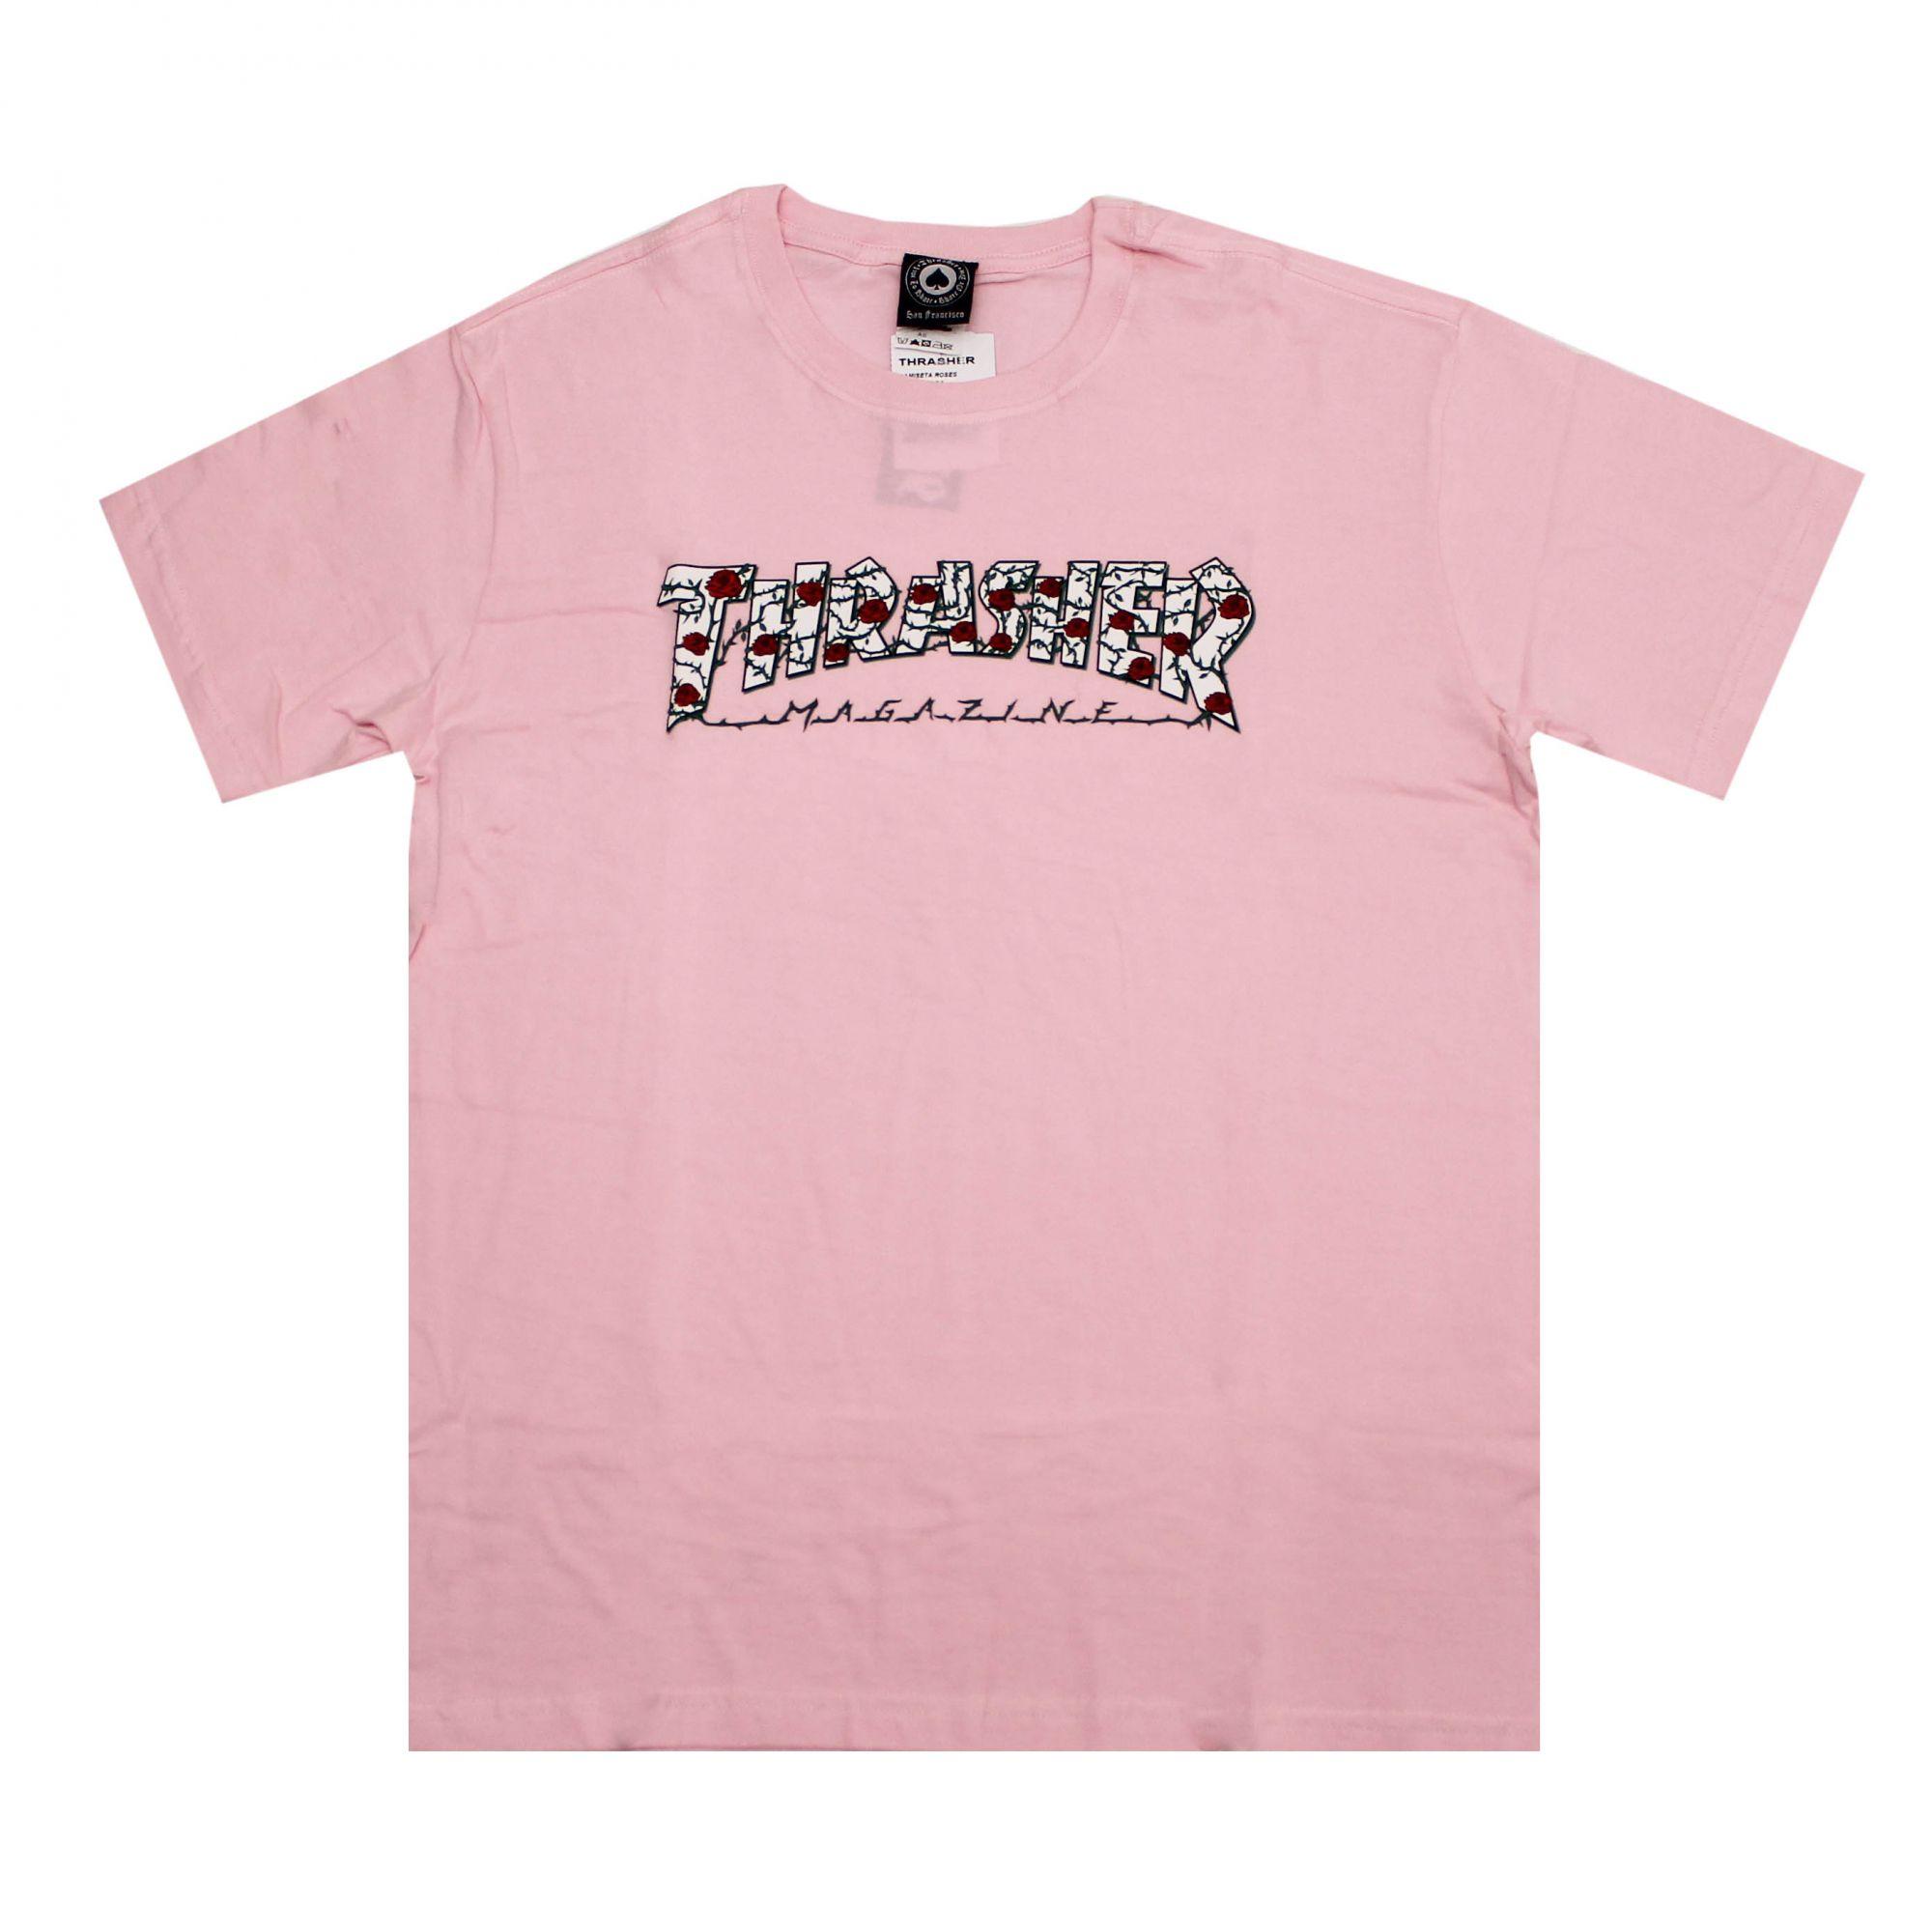 Camiseta Thrasher Magazine Roses Rosa Claro